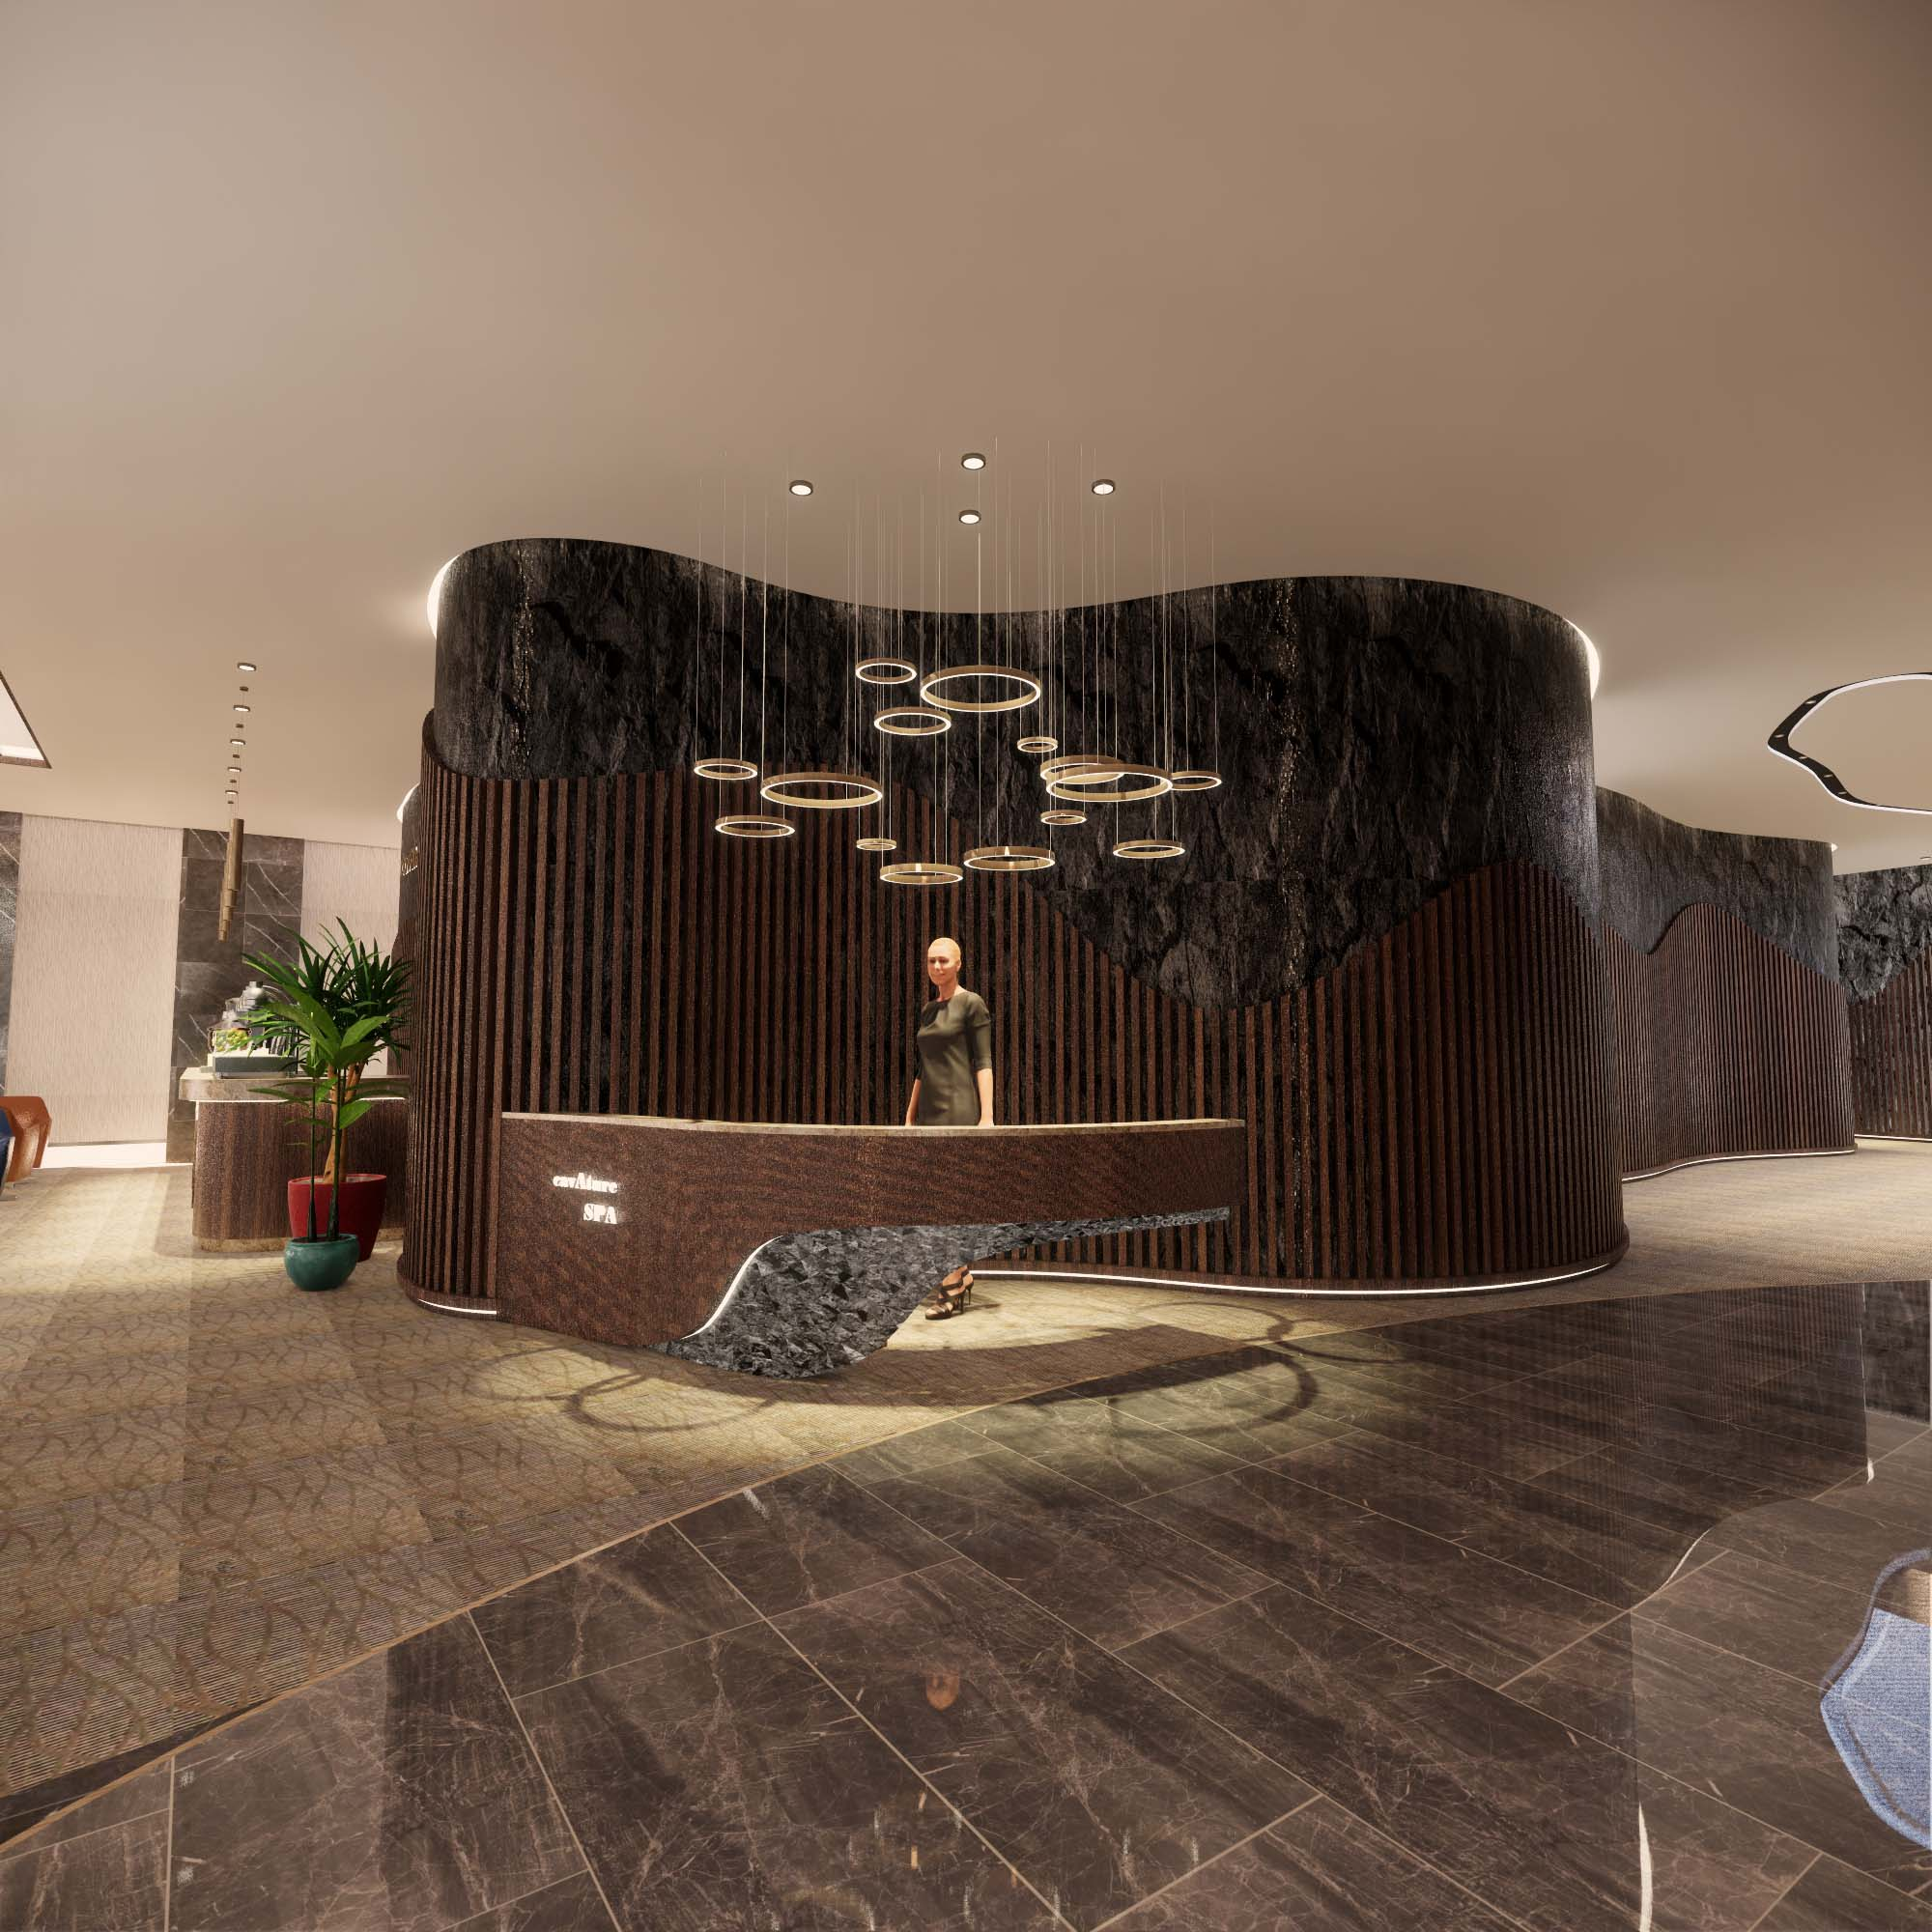 hong kong Top Interior Designers From Hong Kong SPA Reception 1 design Design Hubs Of The World – Top Interior Designers From Hong Kong SPA Reception 1